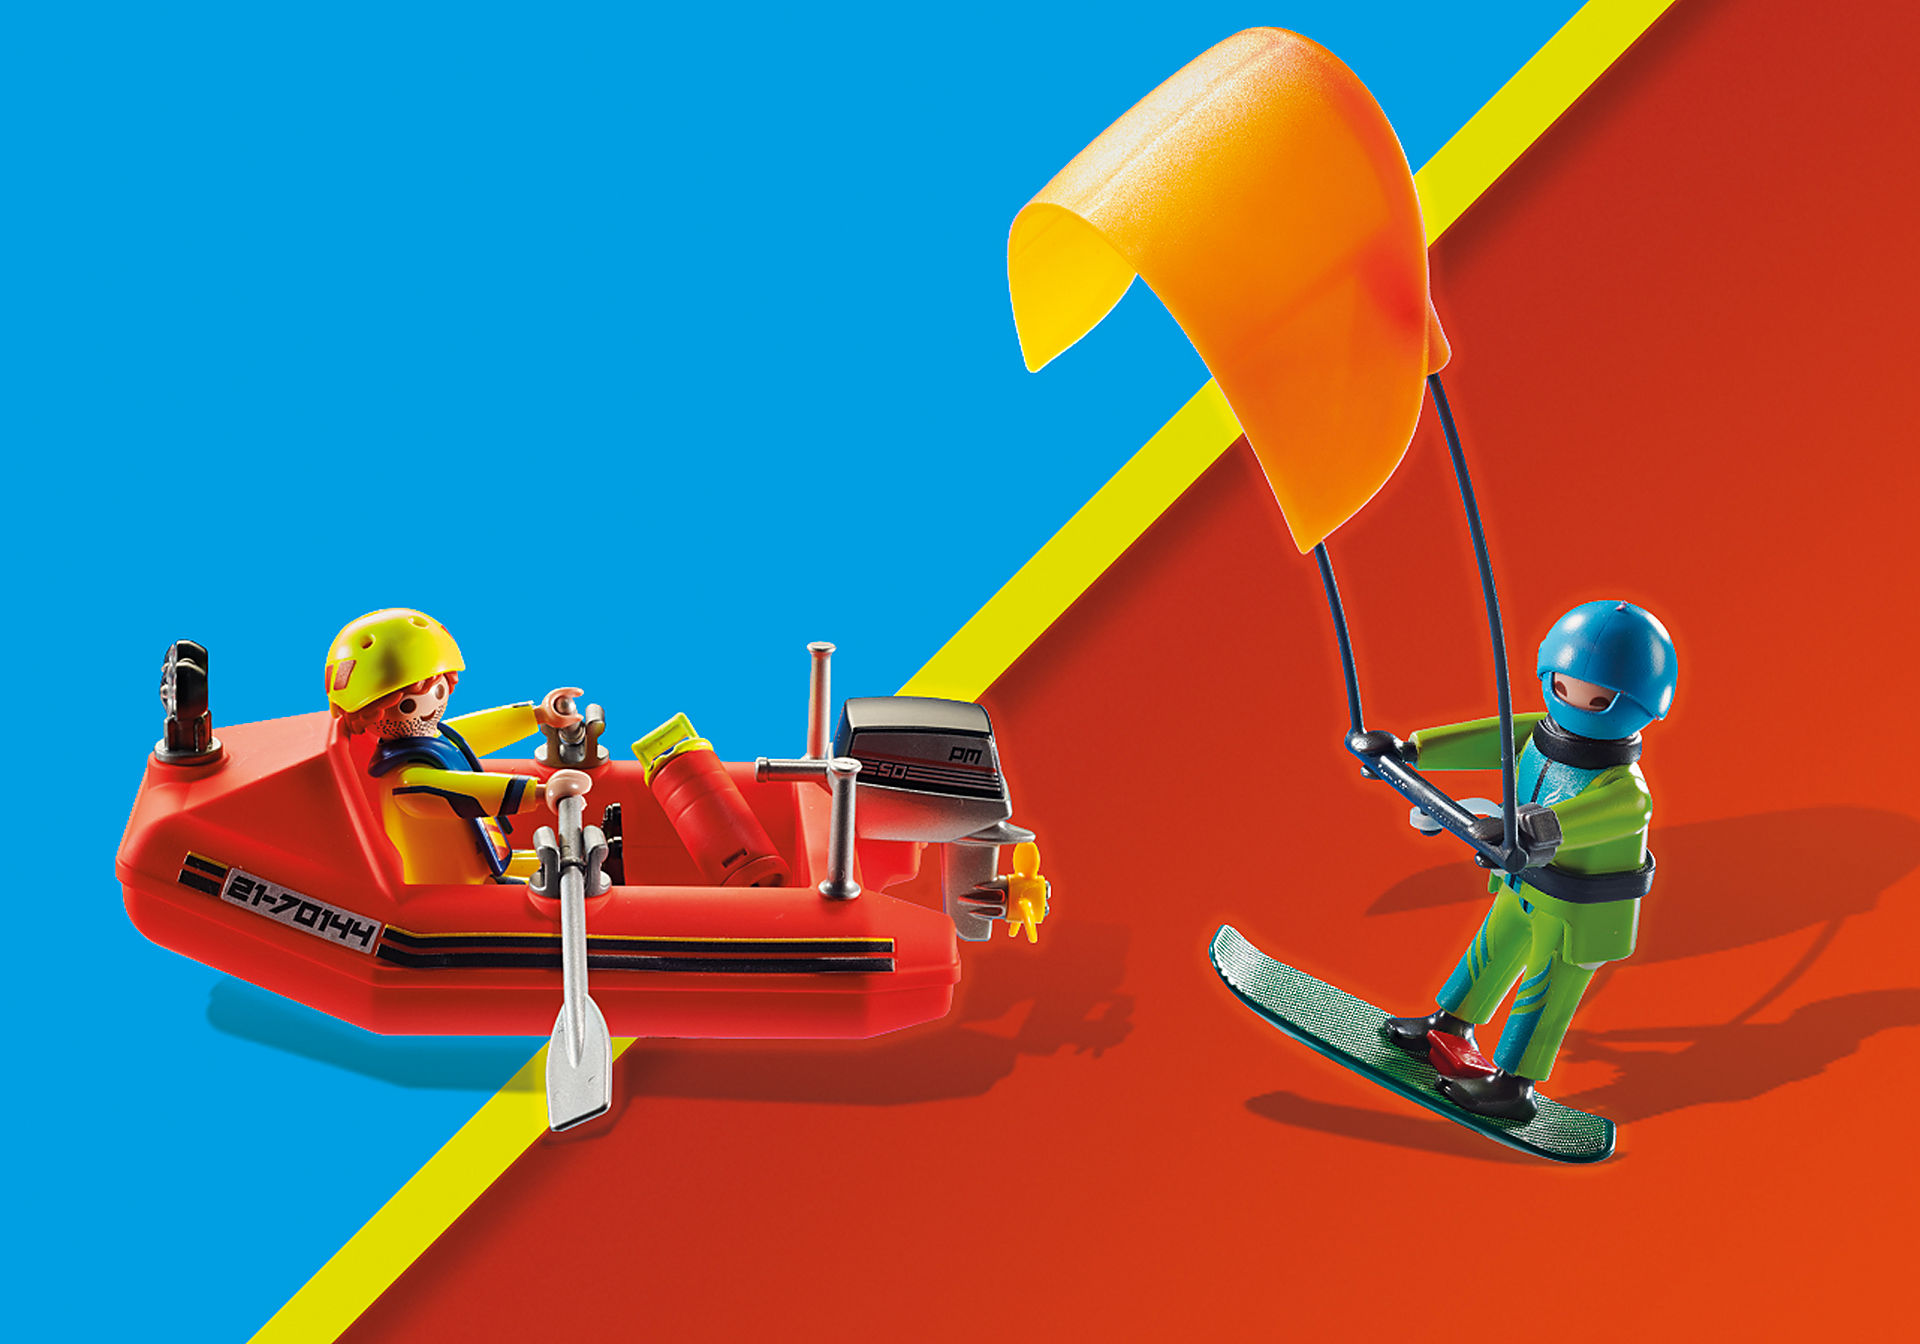 70144 Kitesurfer Rescue with Speedboat zoom image6